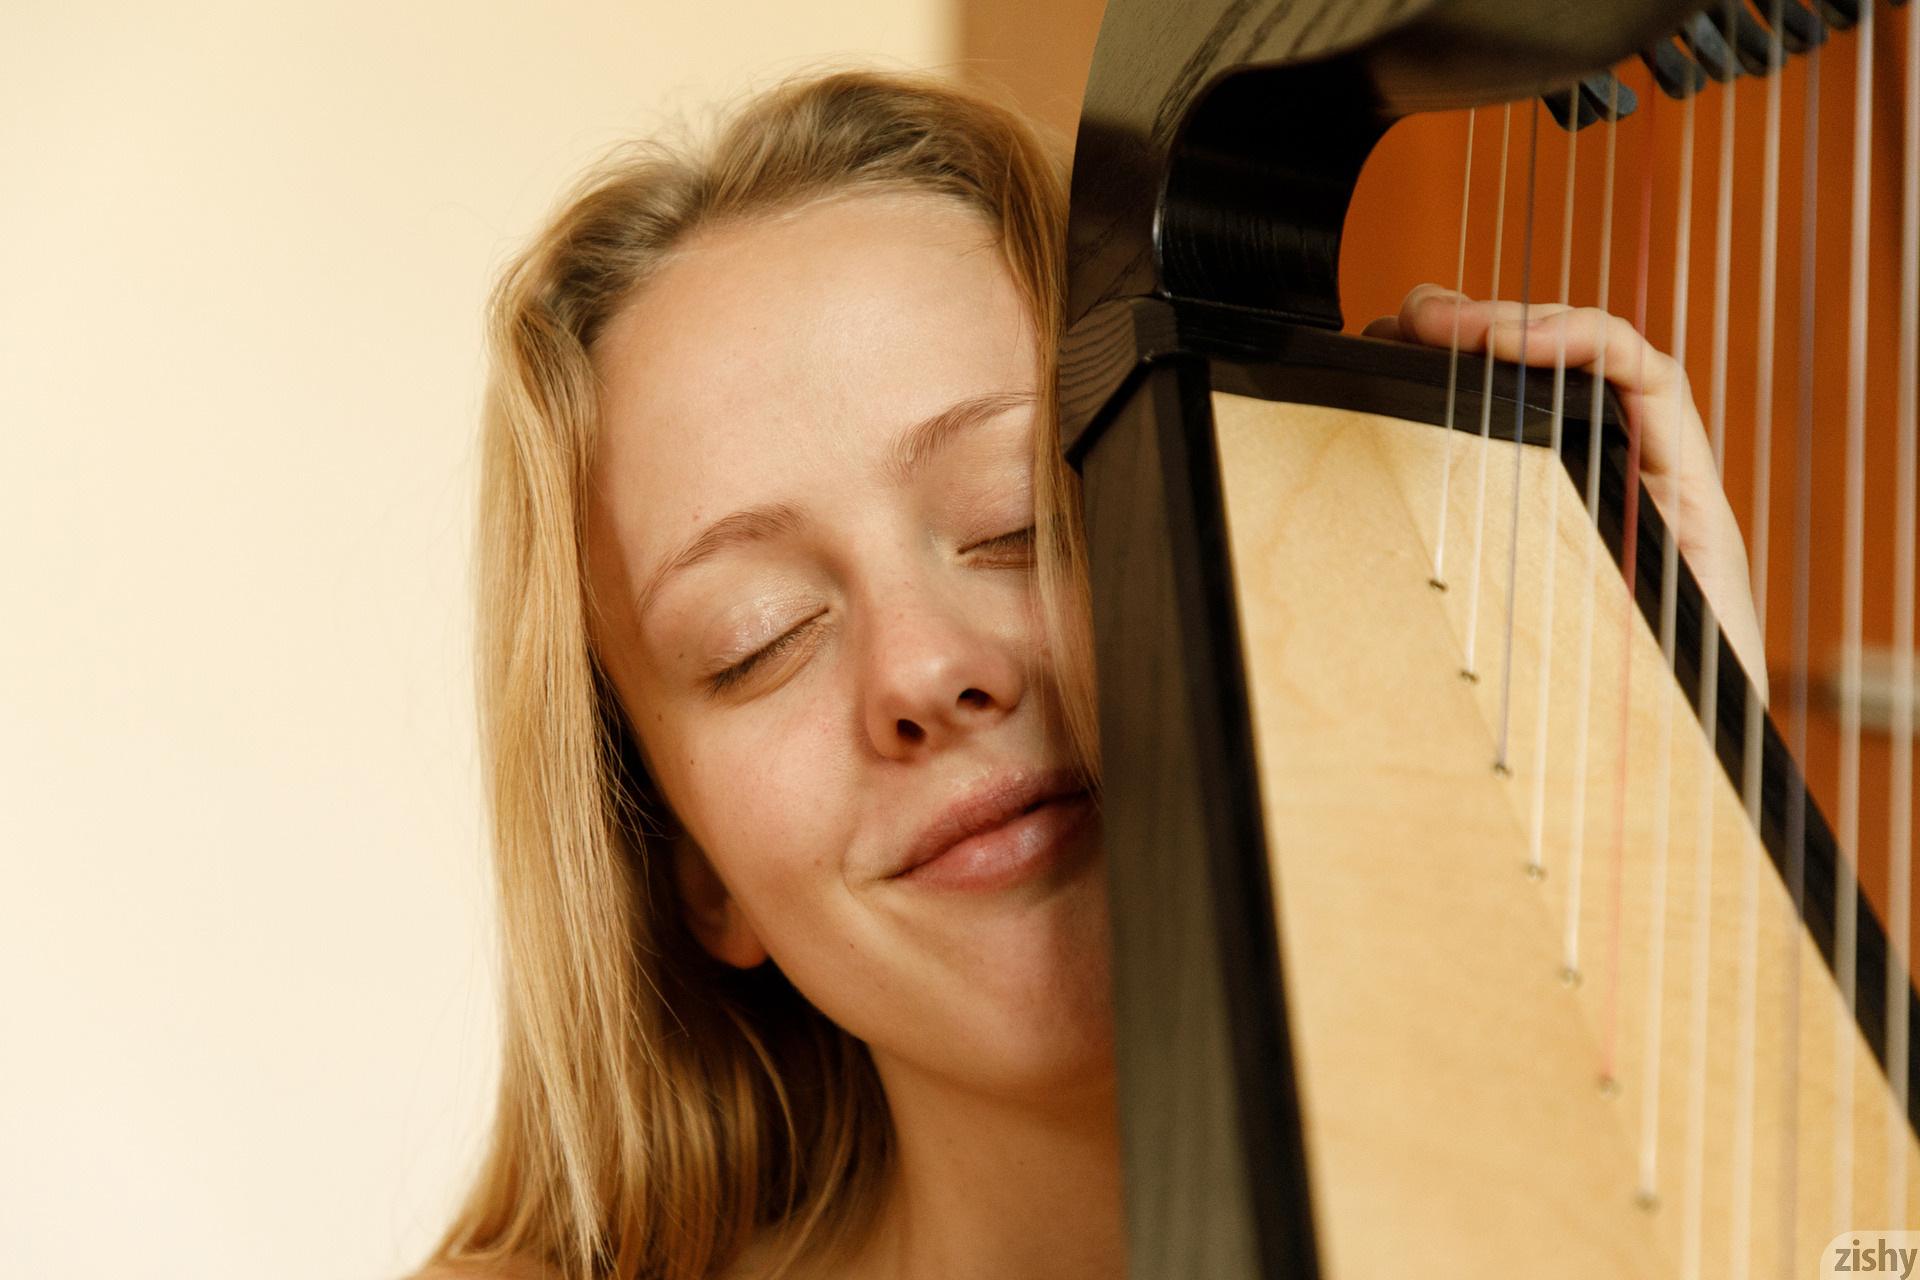 Helen Bergstrom Show Me Your Strings Zishy (34)